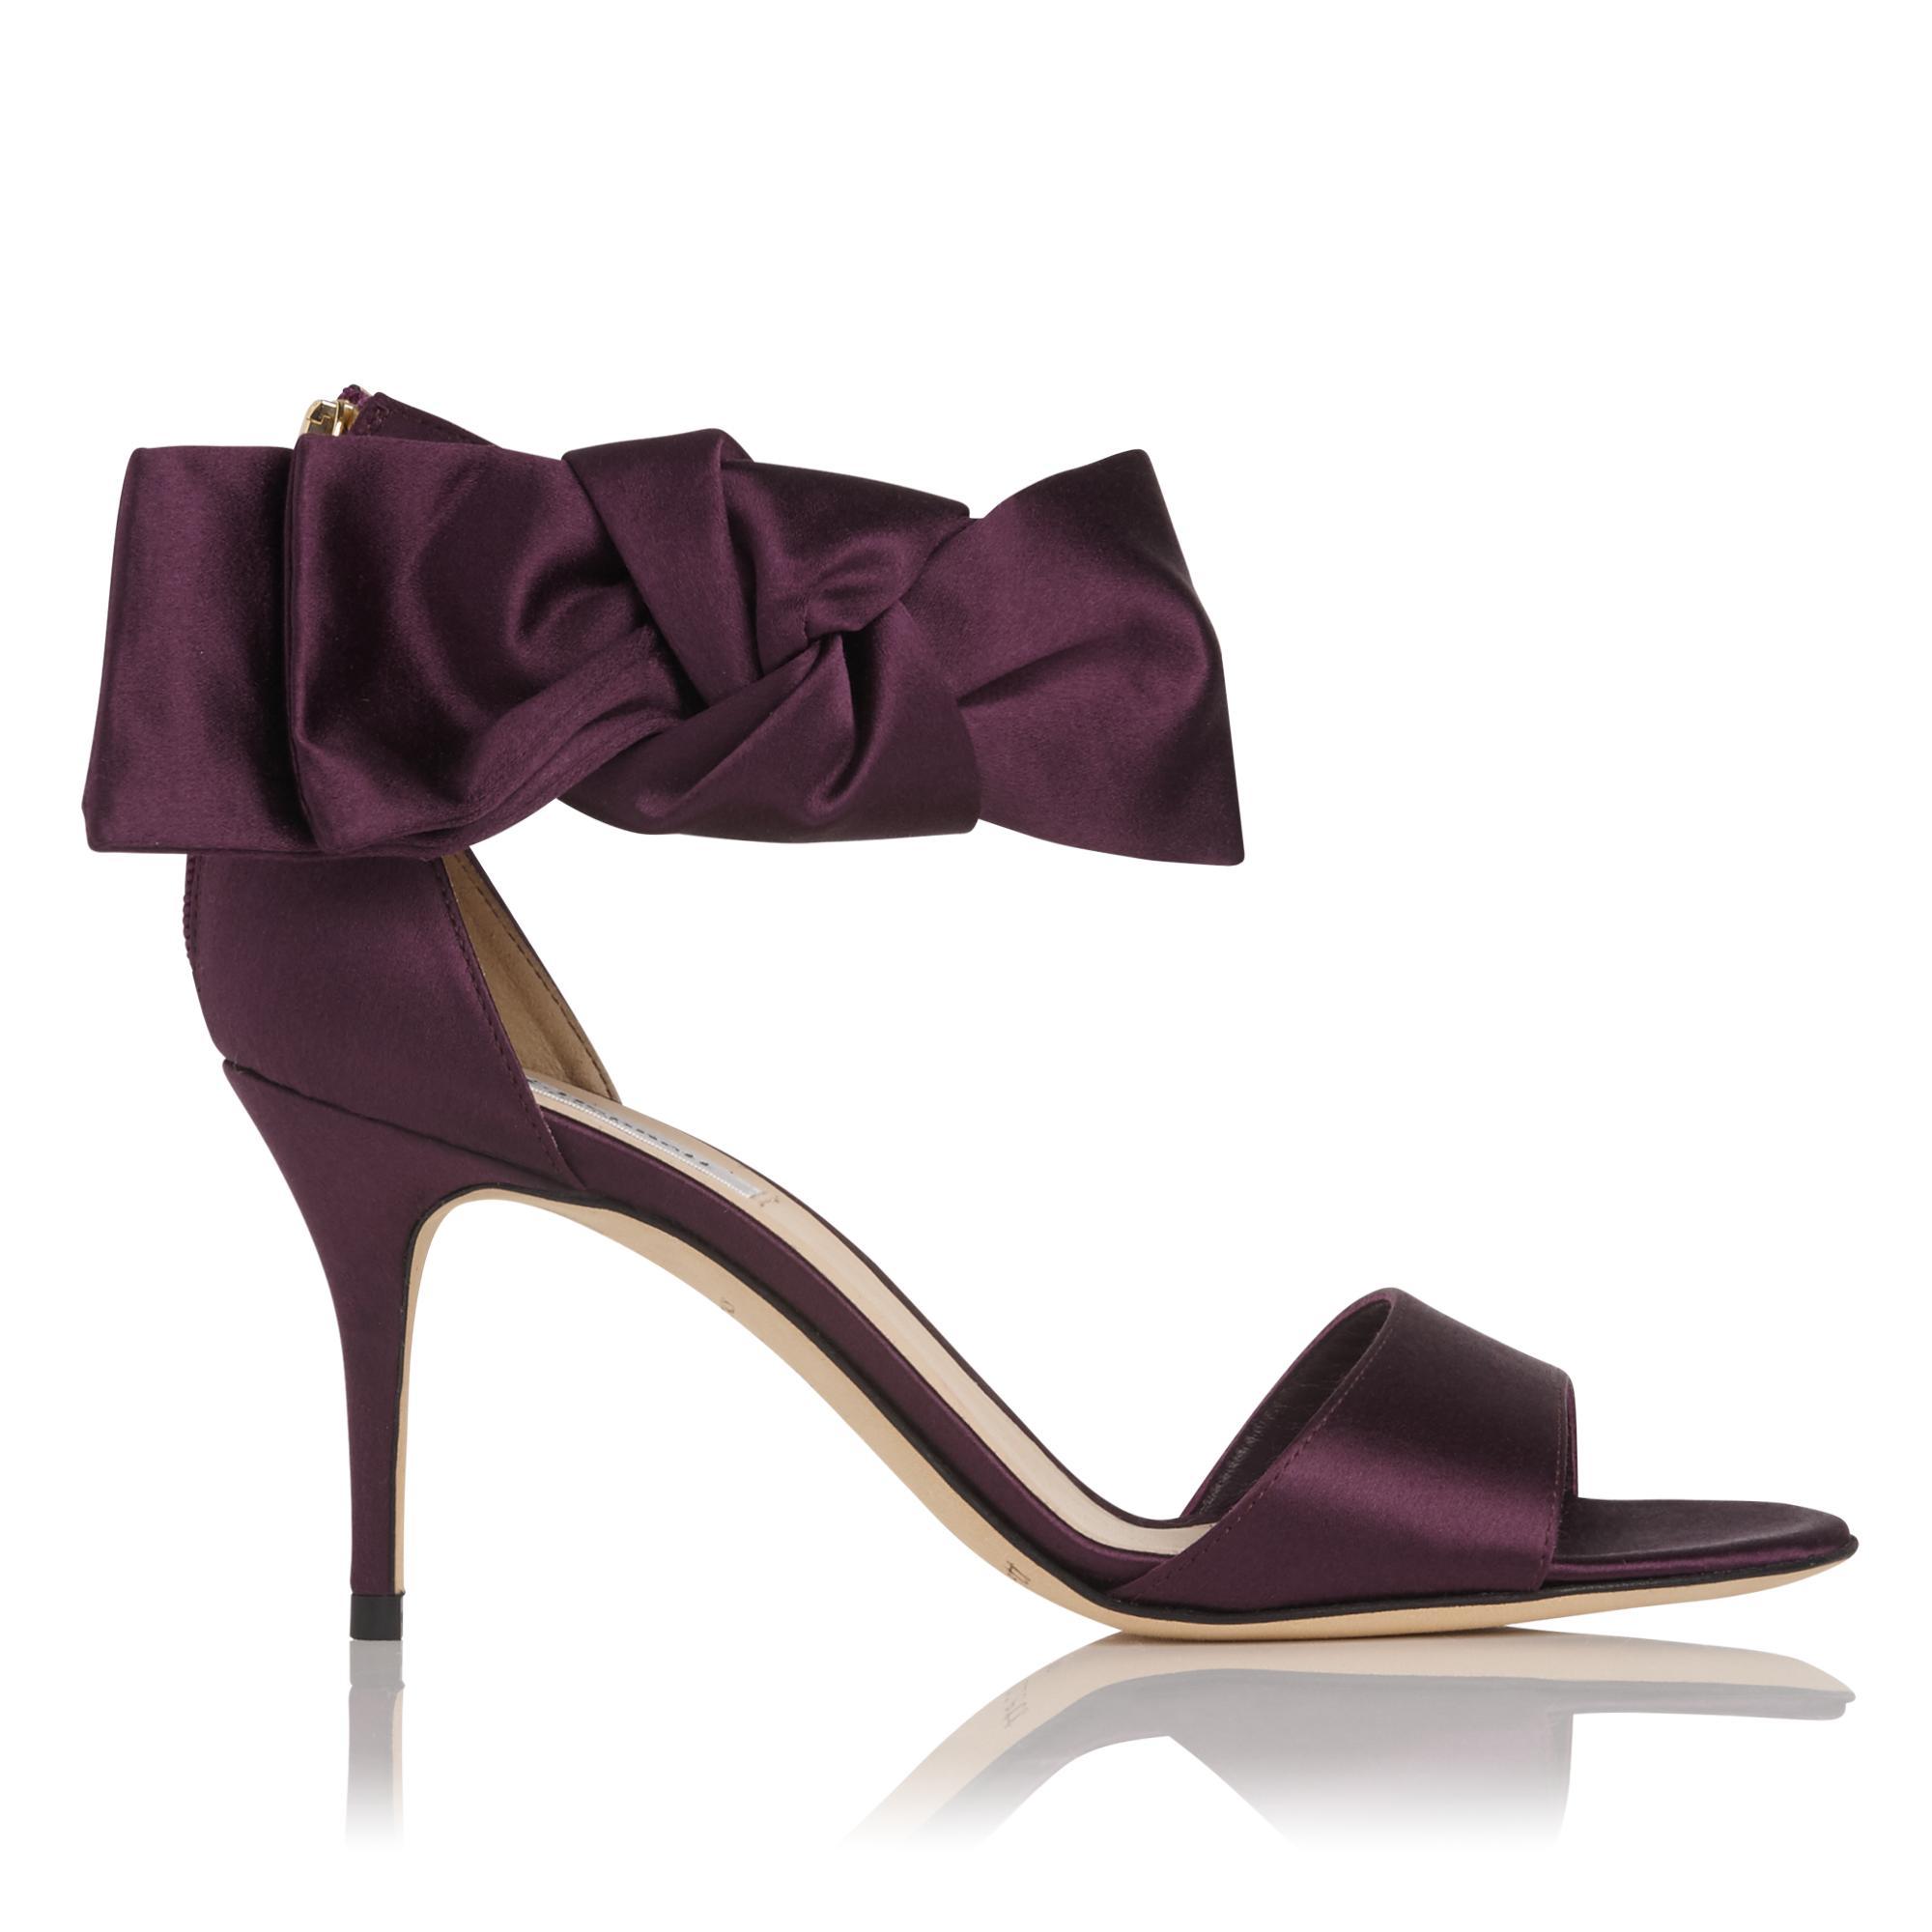 Agata Loganberry Satin Sandal